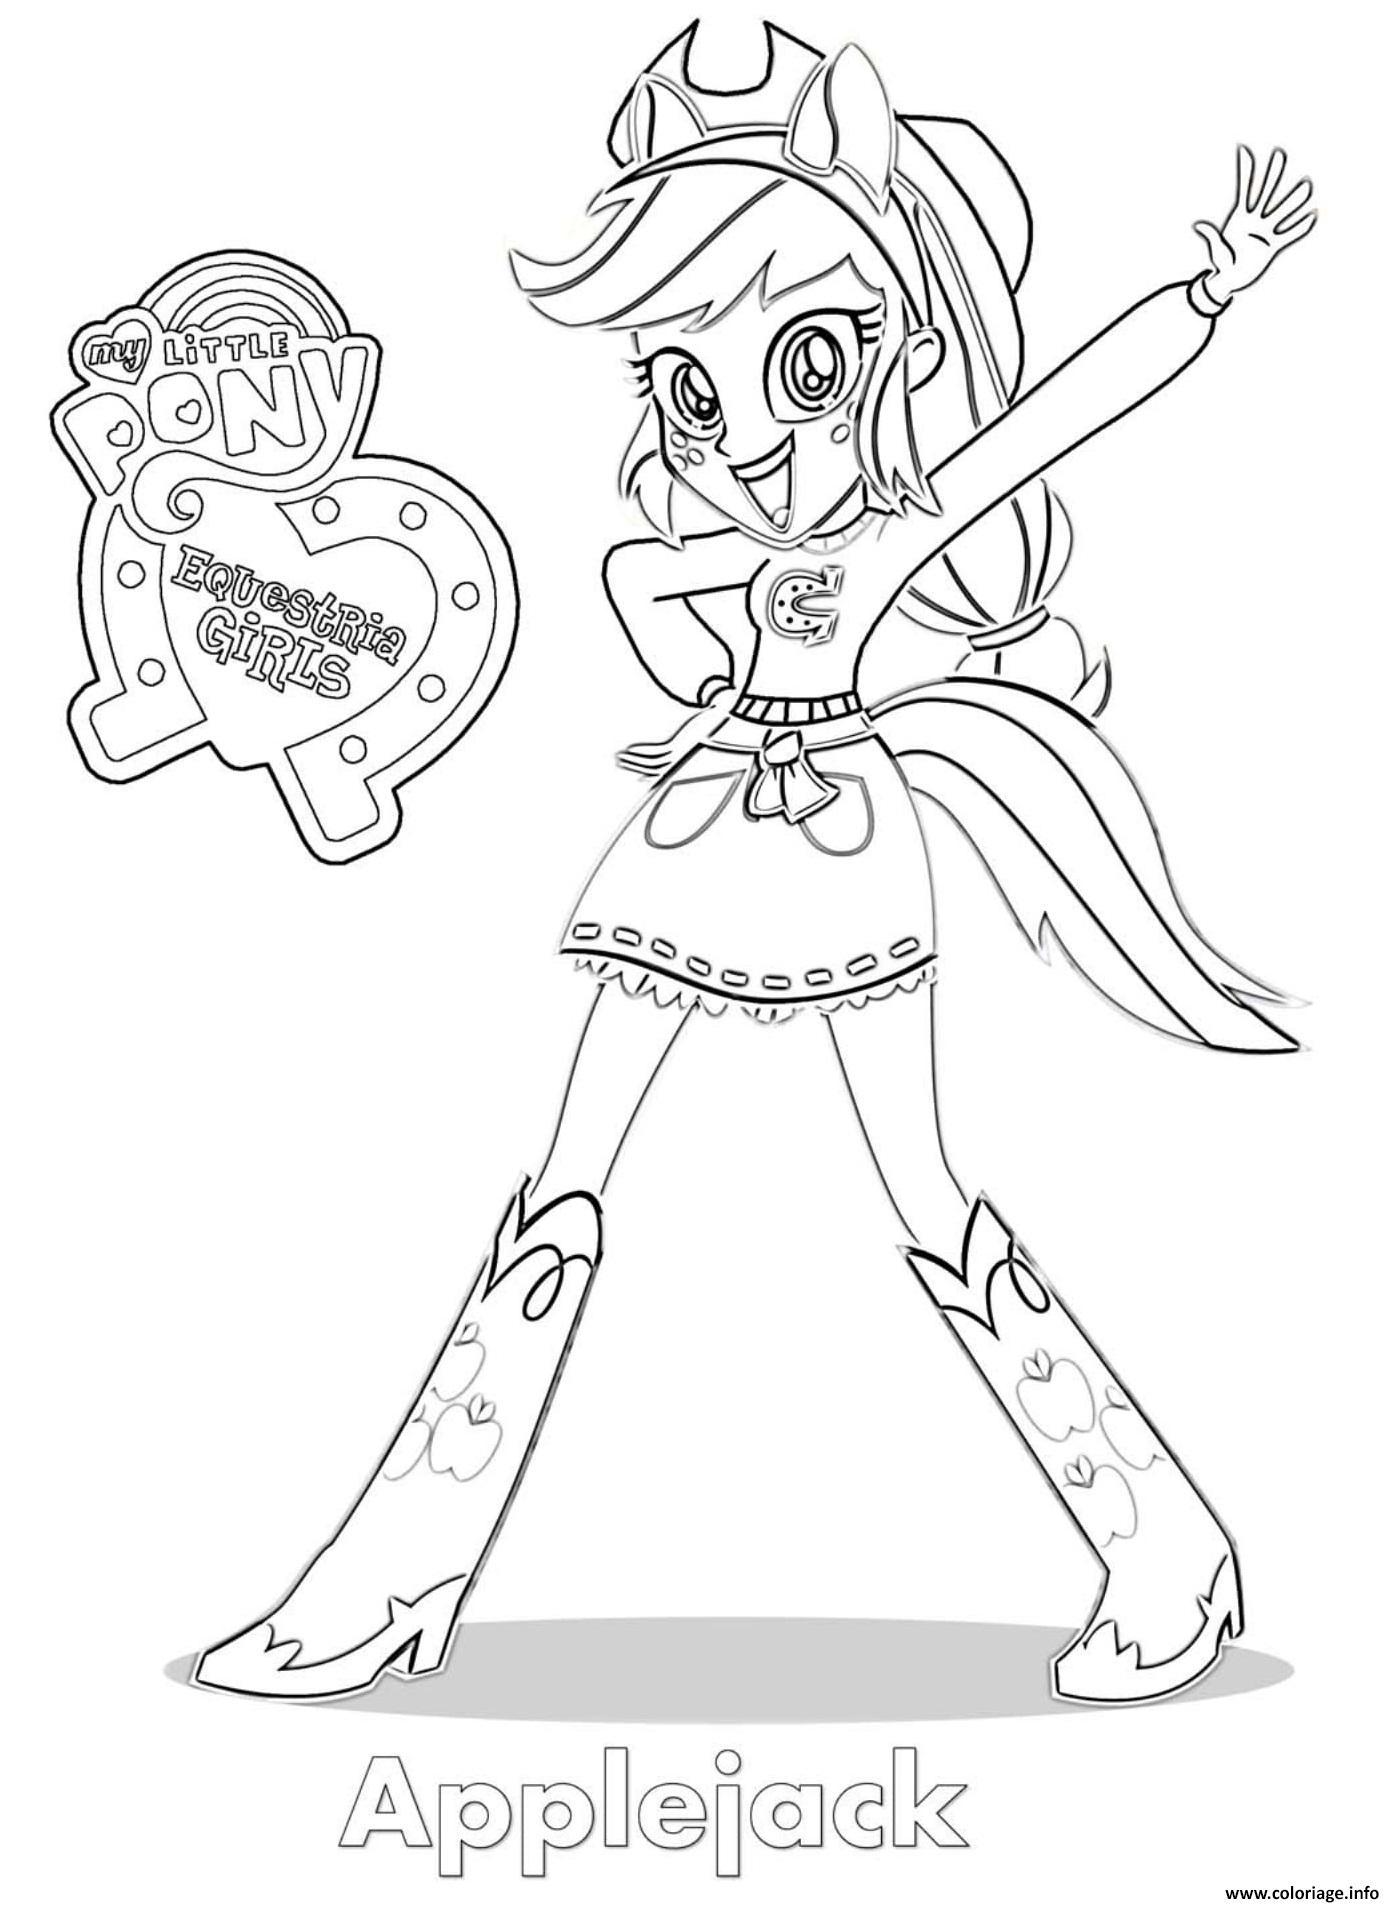 Coloriage Equestria Girls Applejack Dessin